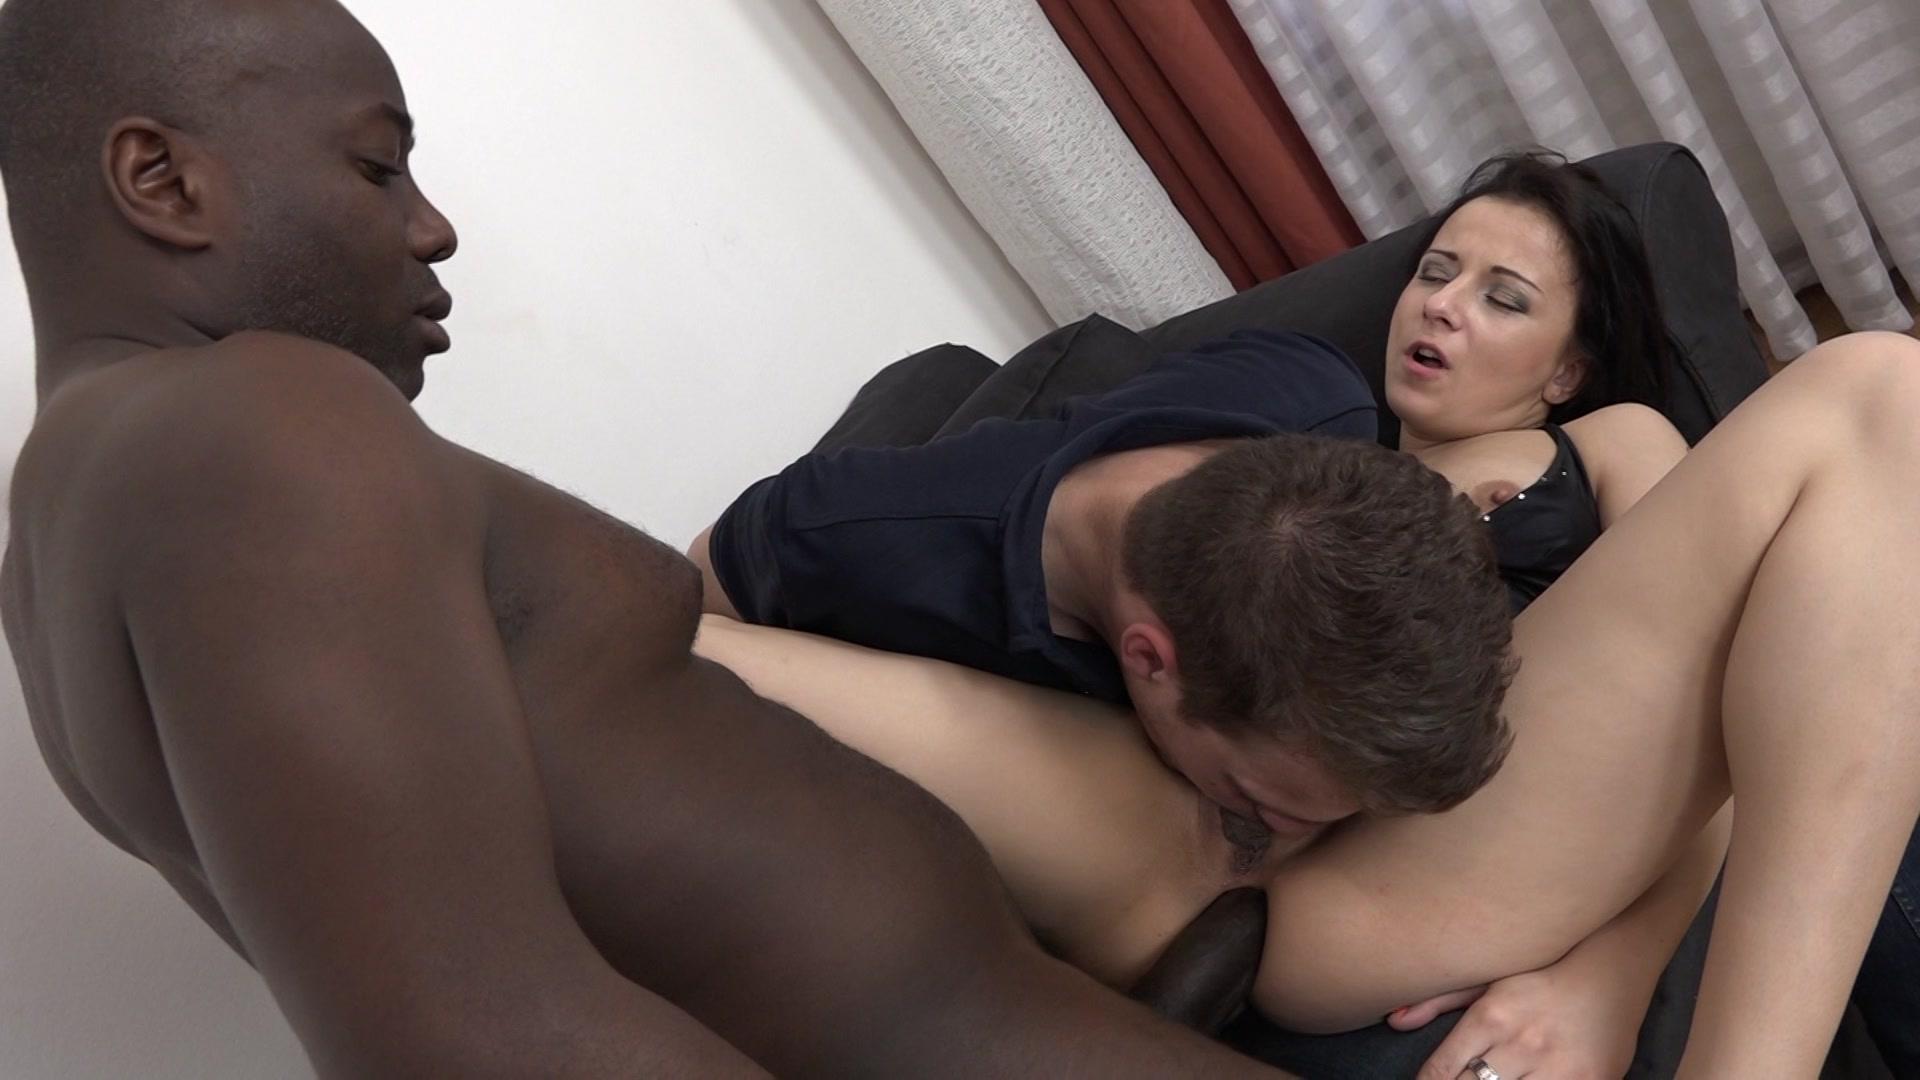 Mahina zaltana fucks in a porn stud for her husband